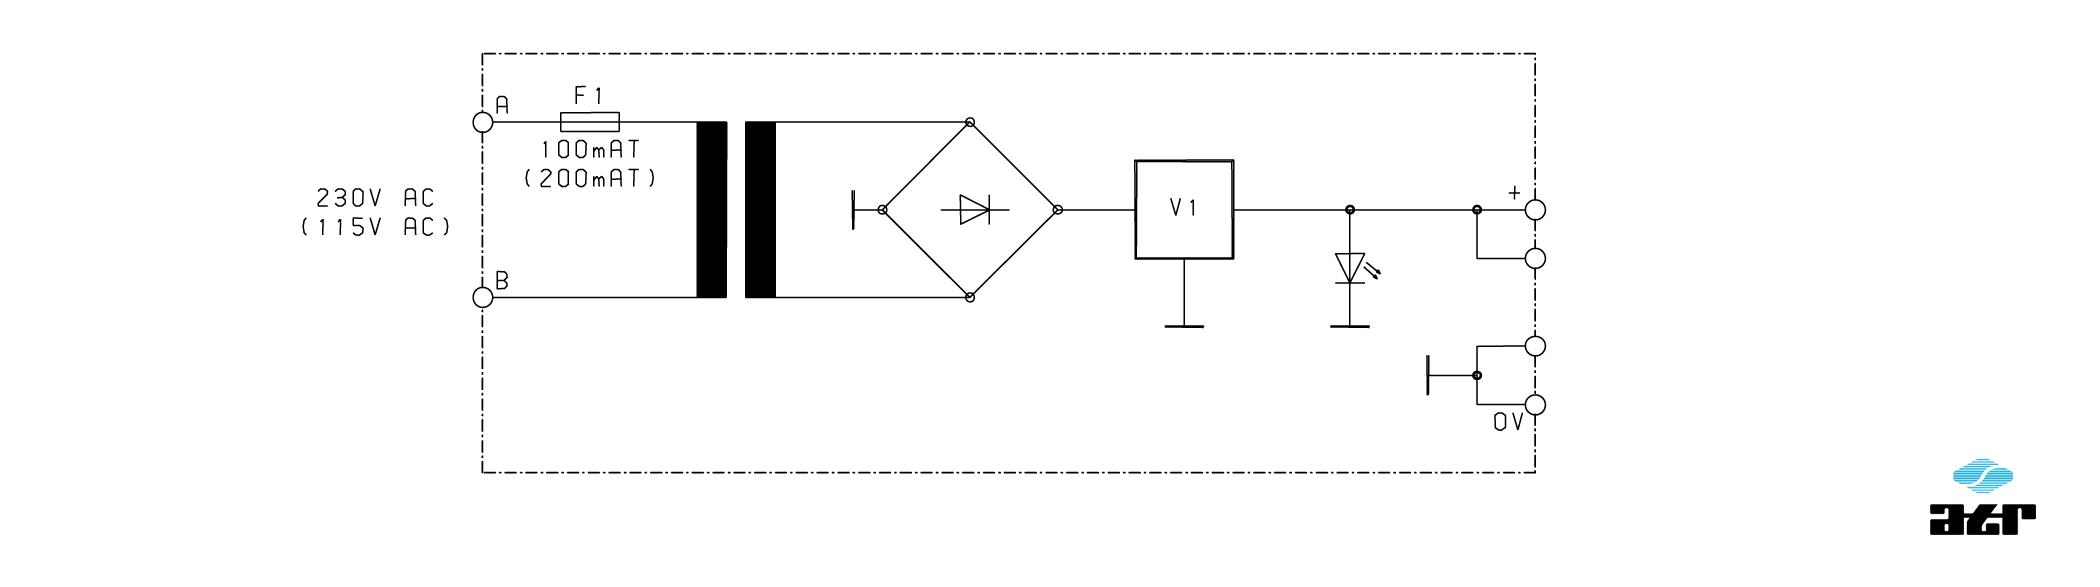 Anschlussplan: ATR Netzgerät NM324, NM415, NM605